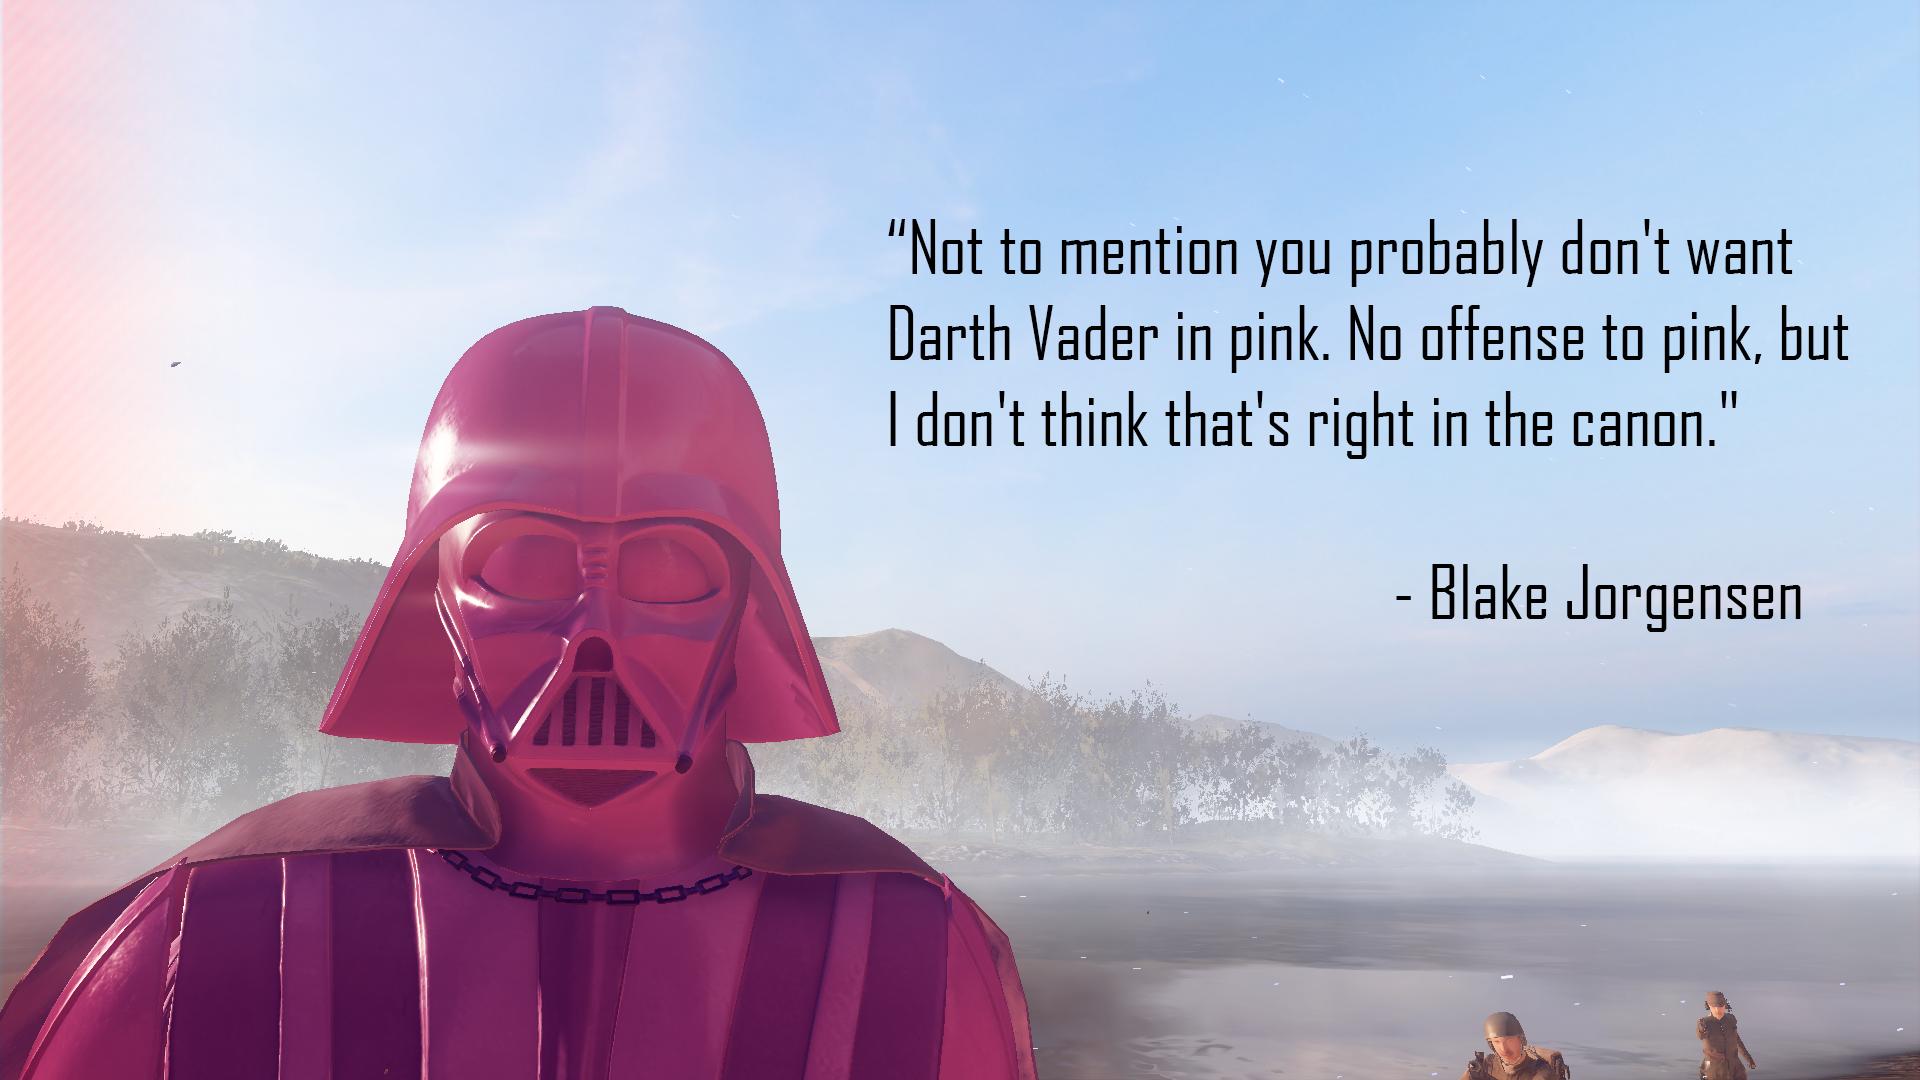 The Top 10 Star Wars Battlefront 2 2017 Mods Gamewatcher